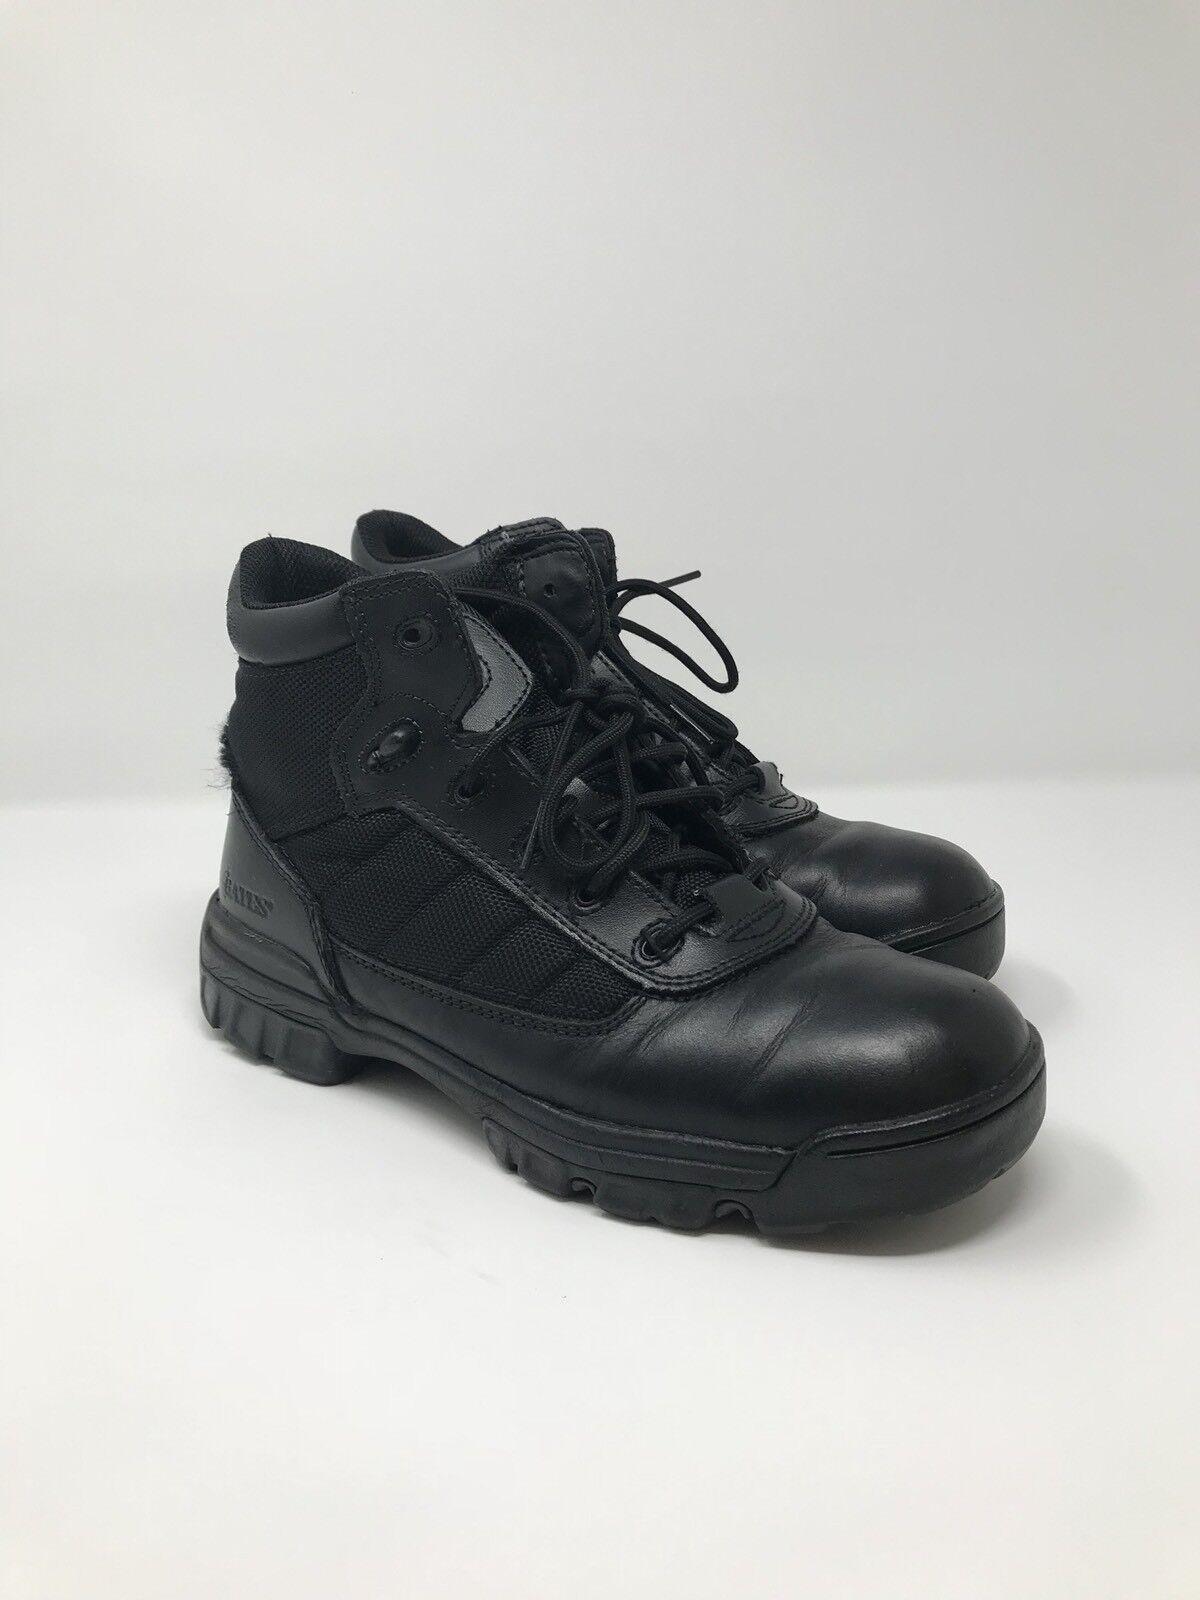 Bates E02762 Enforcer 5  Tactical Police Sport SWAT Ankle Boots Women's US 6.5M